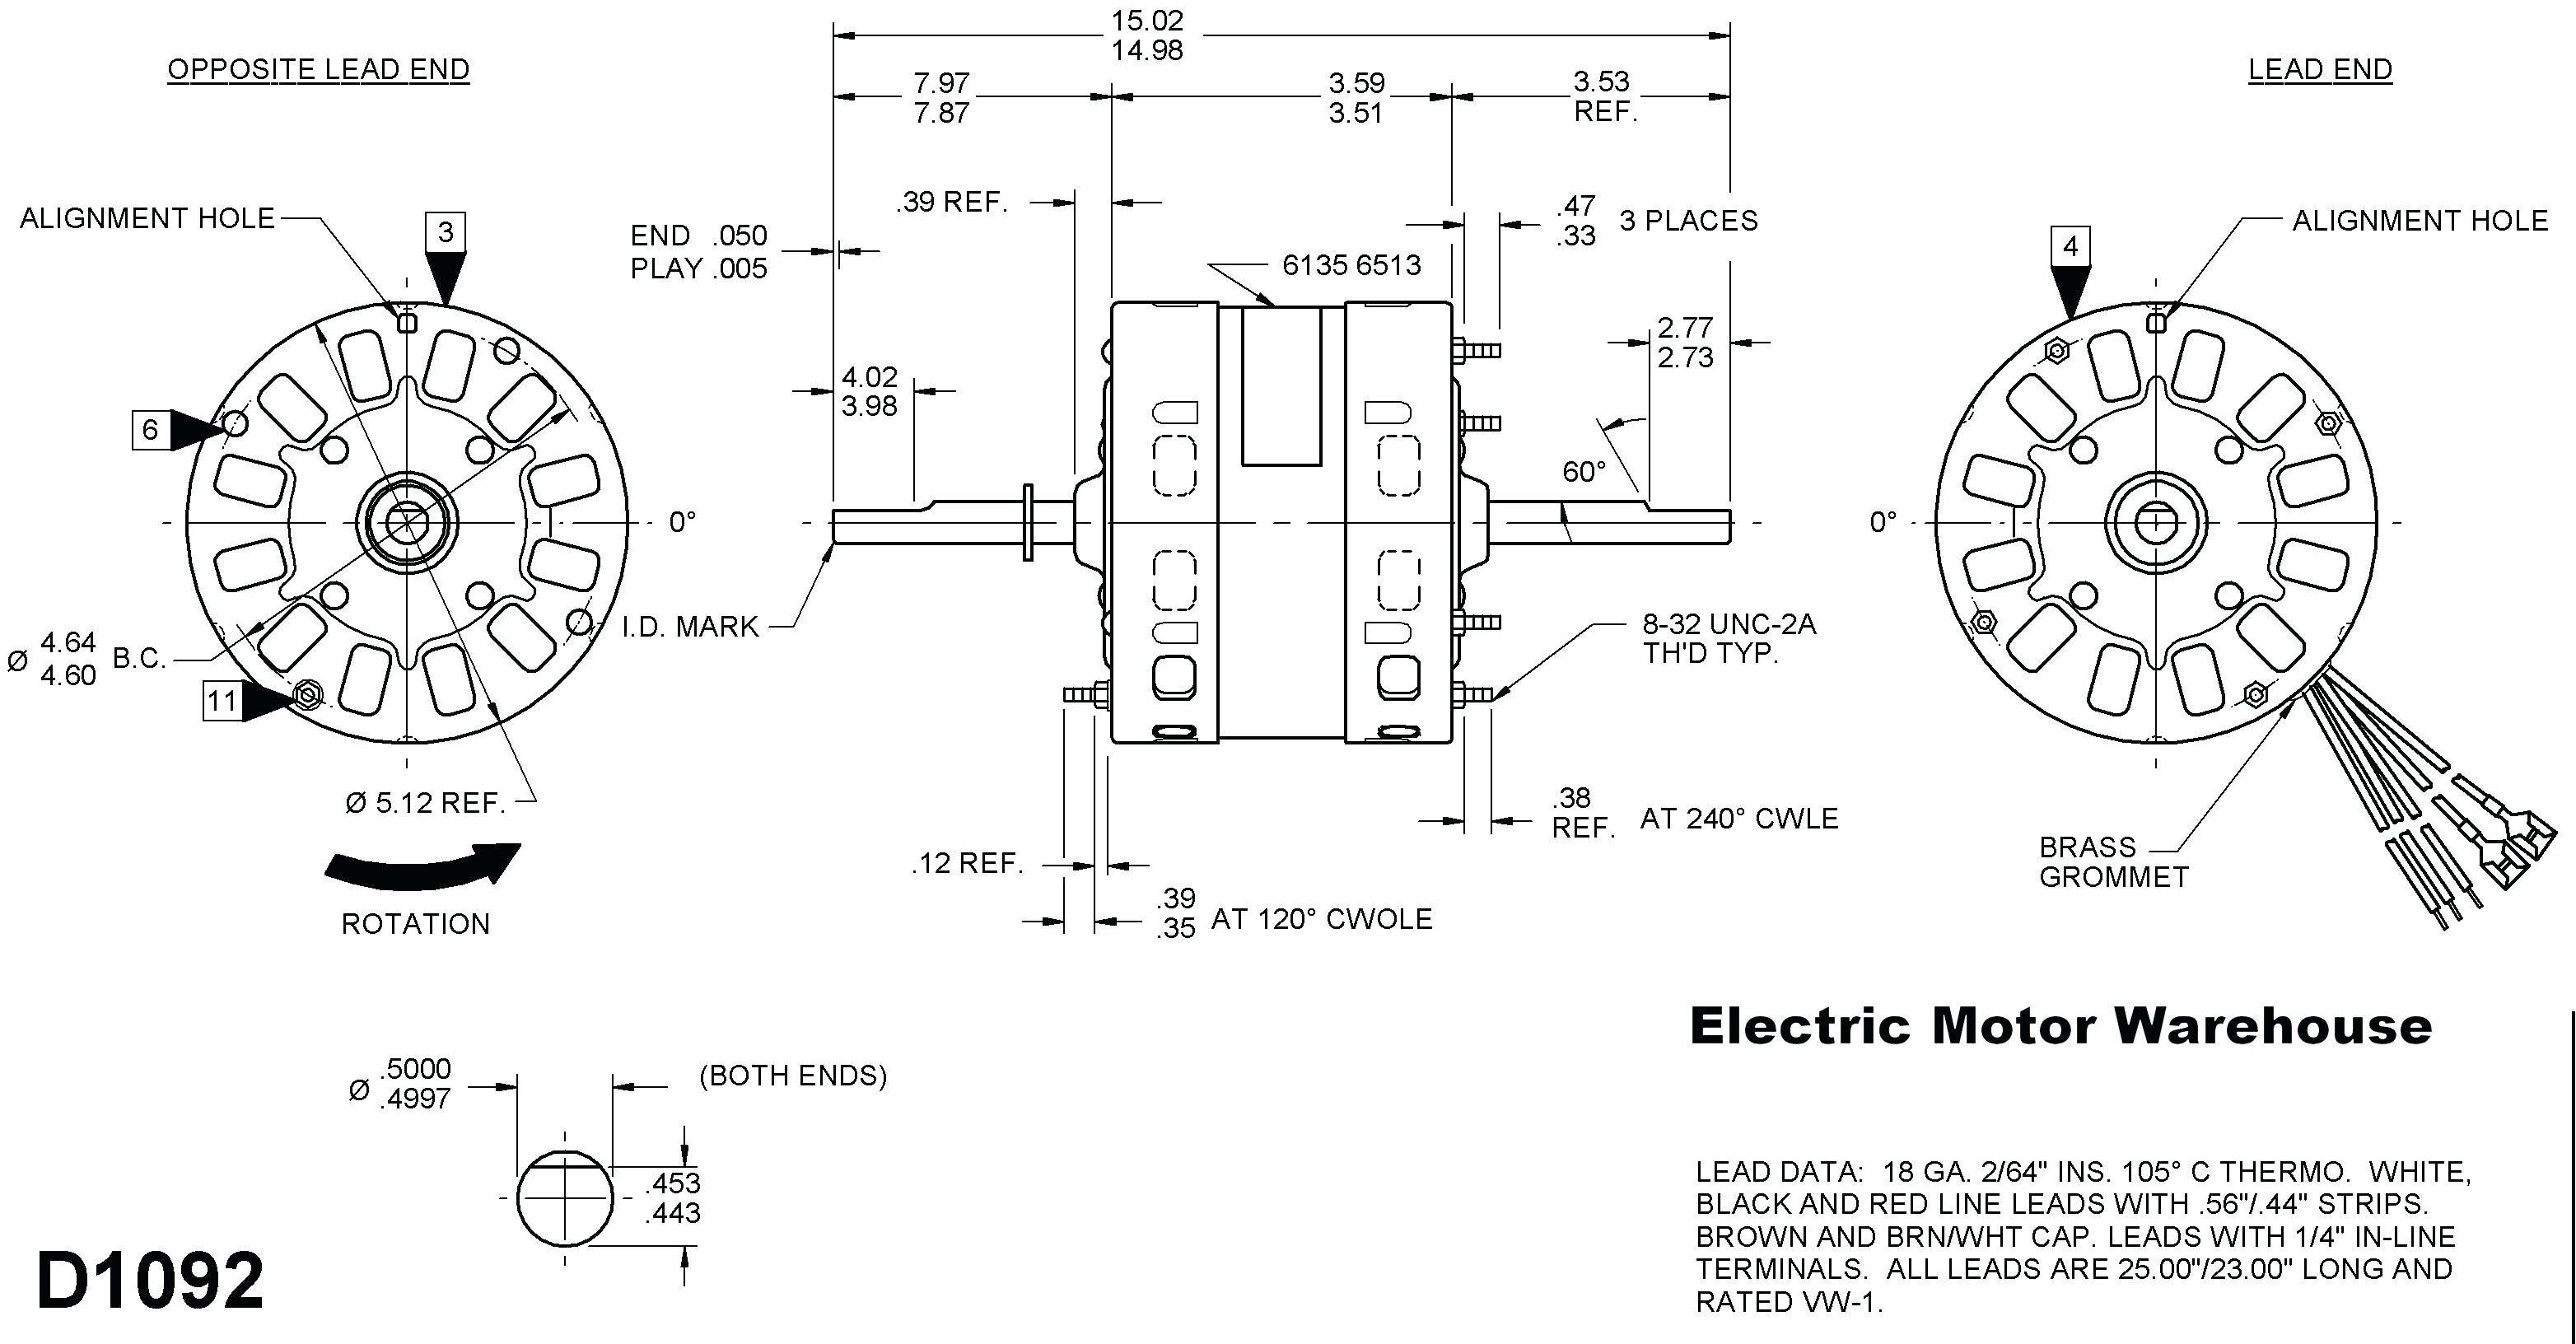 fasco blower motor wiring diagram Download-Wiring Diagram For Fasco Blower Motor Valid Fasco Blower Motor Wiring Diagram Wiring Diagrams Schematics 5-d